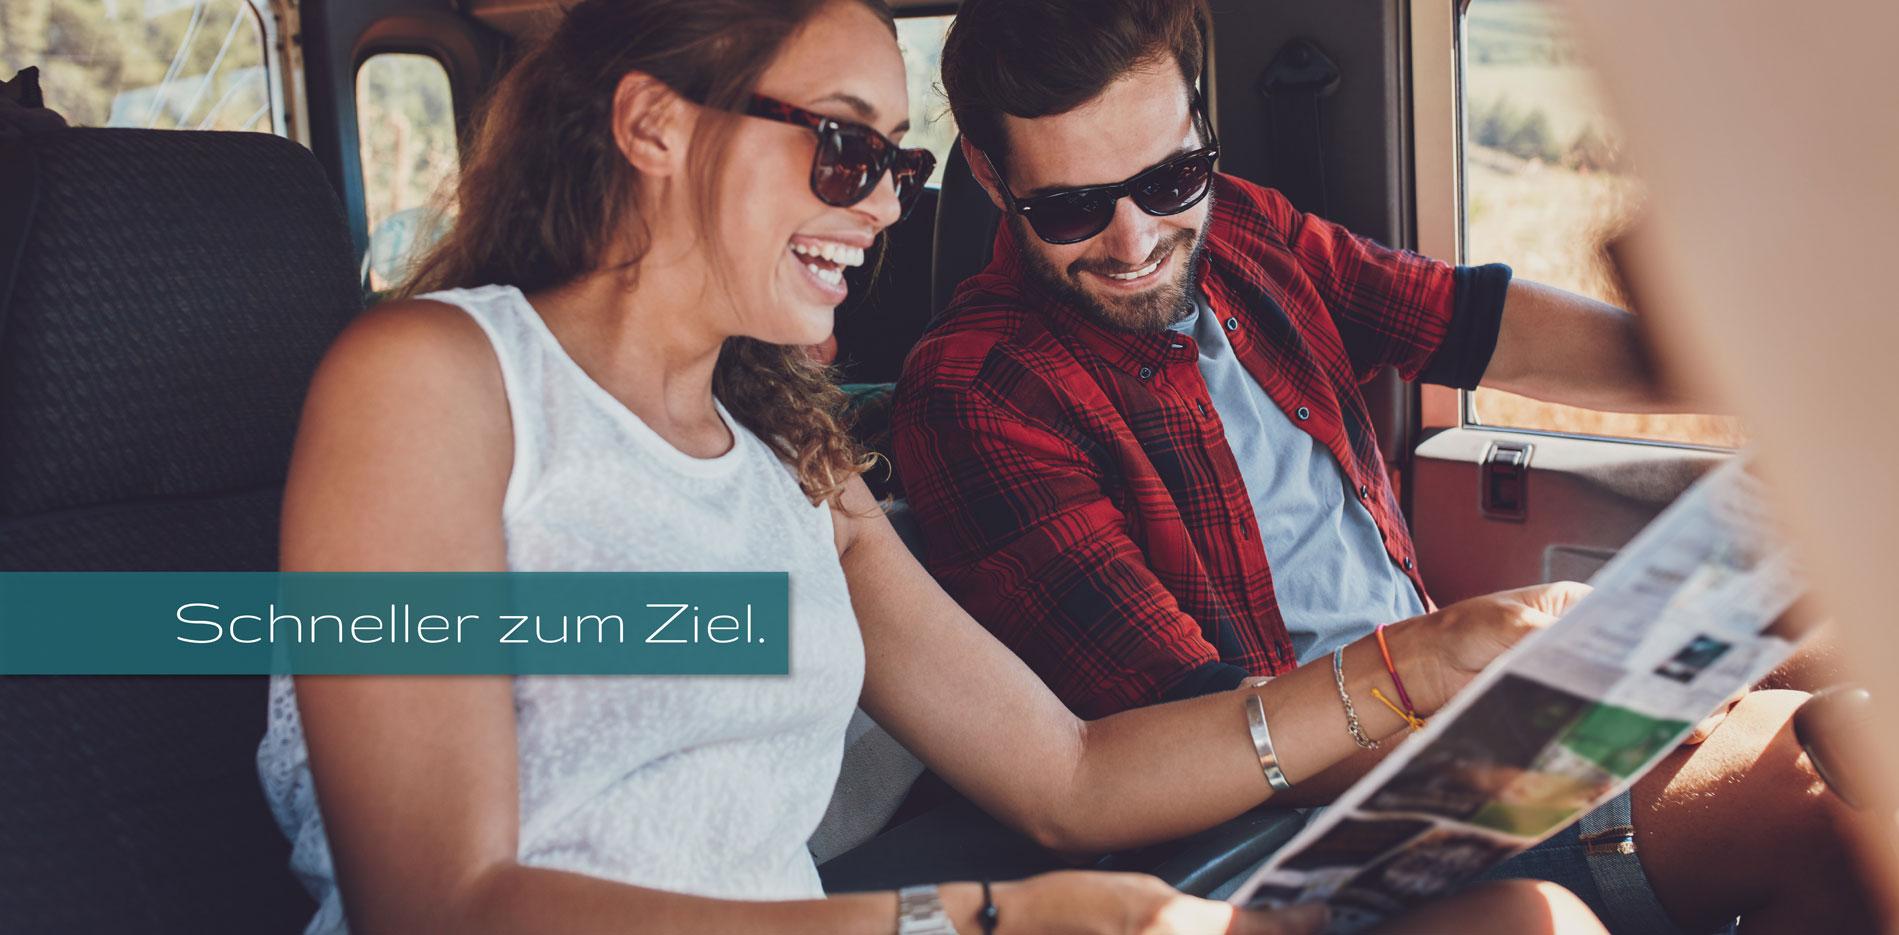 Mobile Kosmetikerin Kosmetik Mobile Visagistin Zürich Sitemap